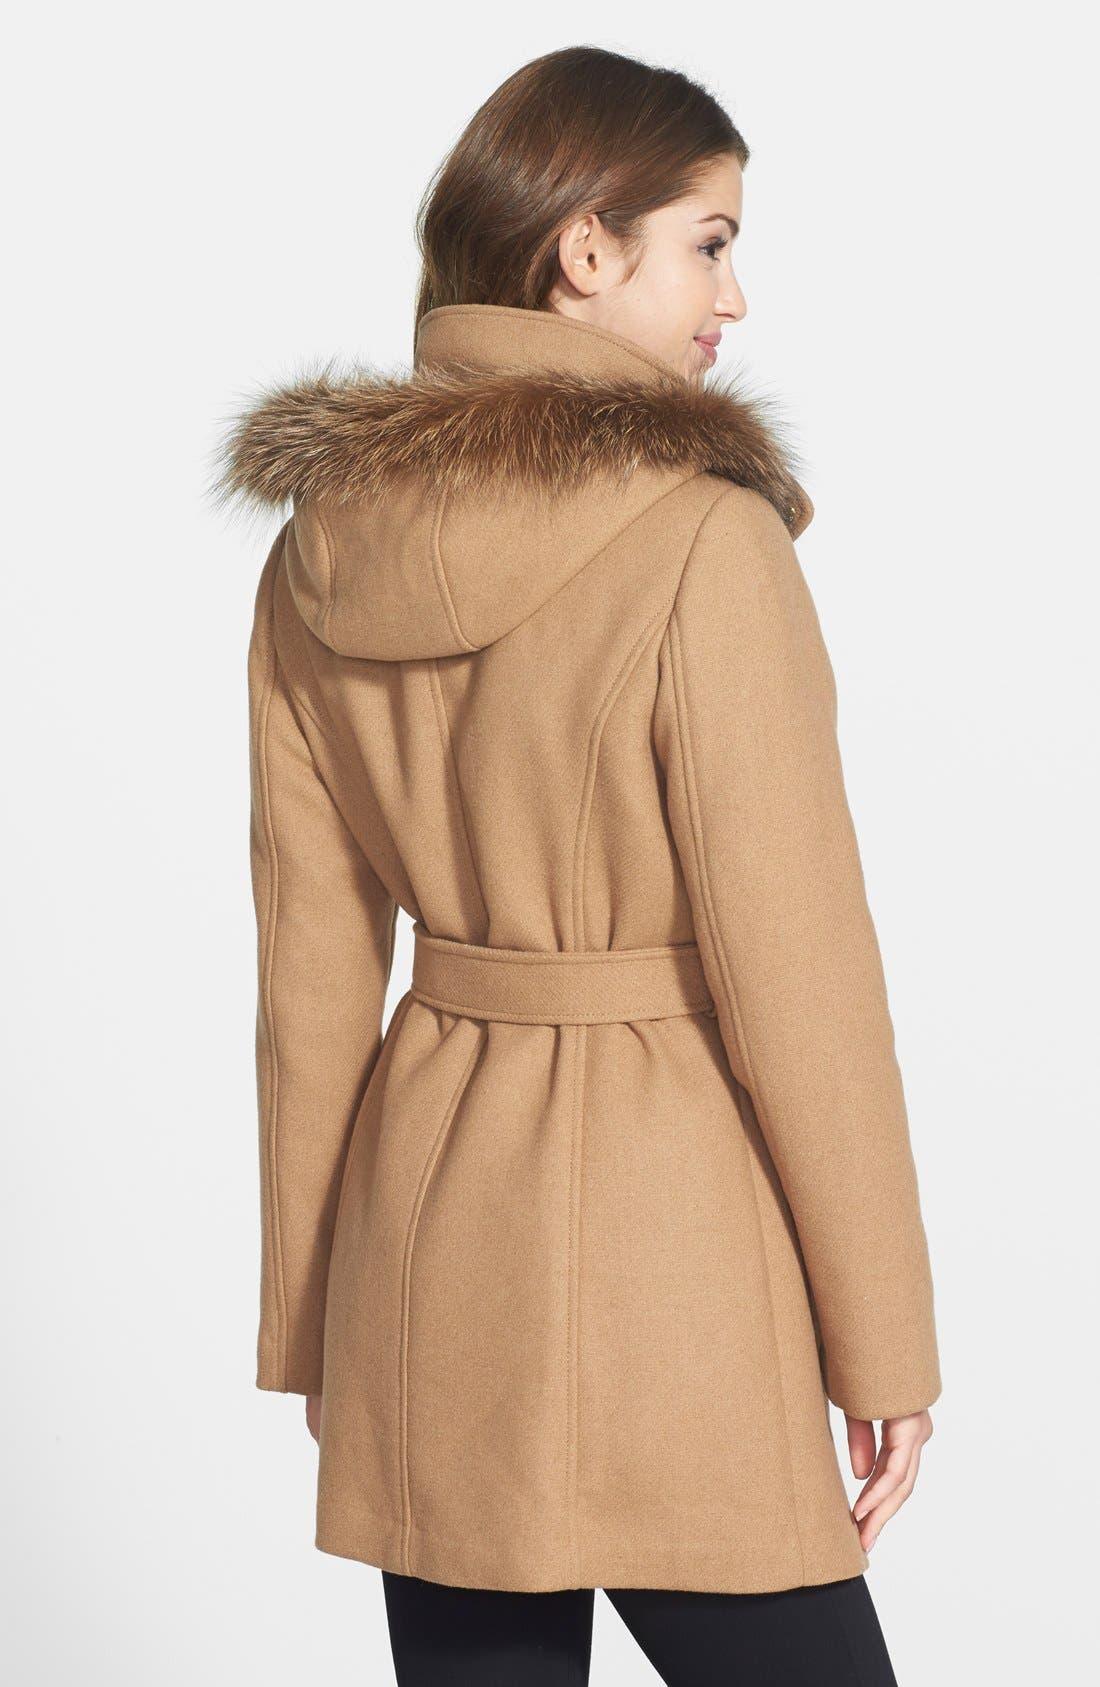 Alternate Image 2  - Ellen Tracy Hooded Wool Blend Coat with Genuine Fox Fur Trim (Online Only)